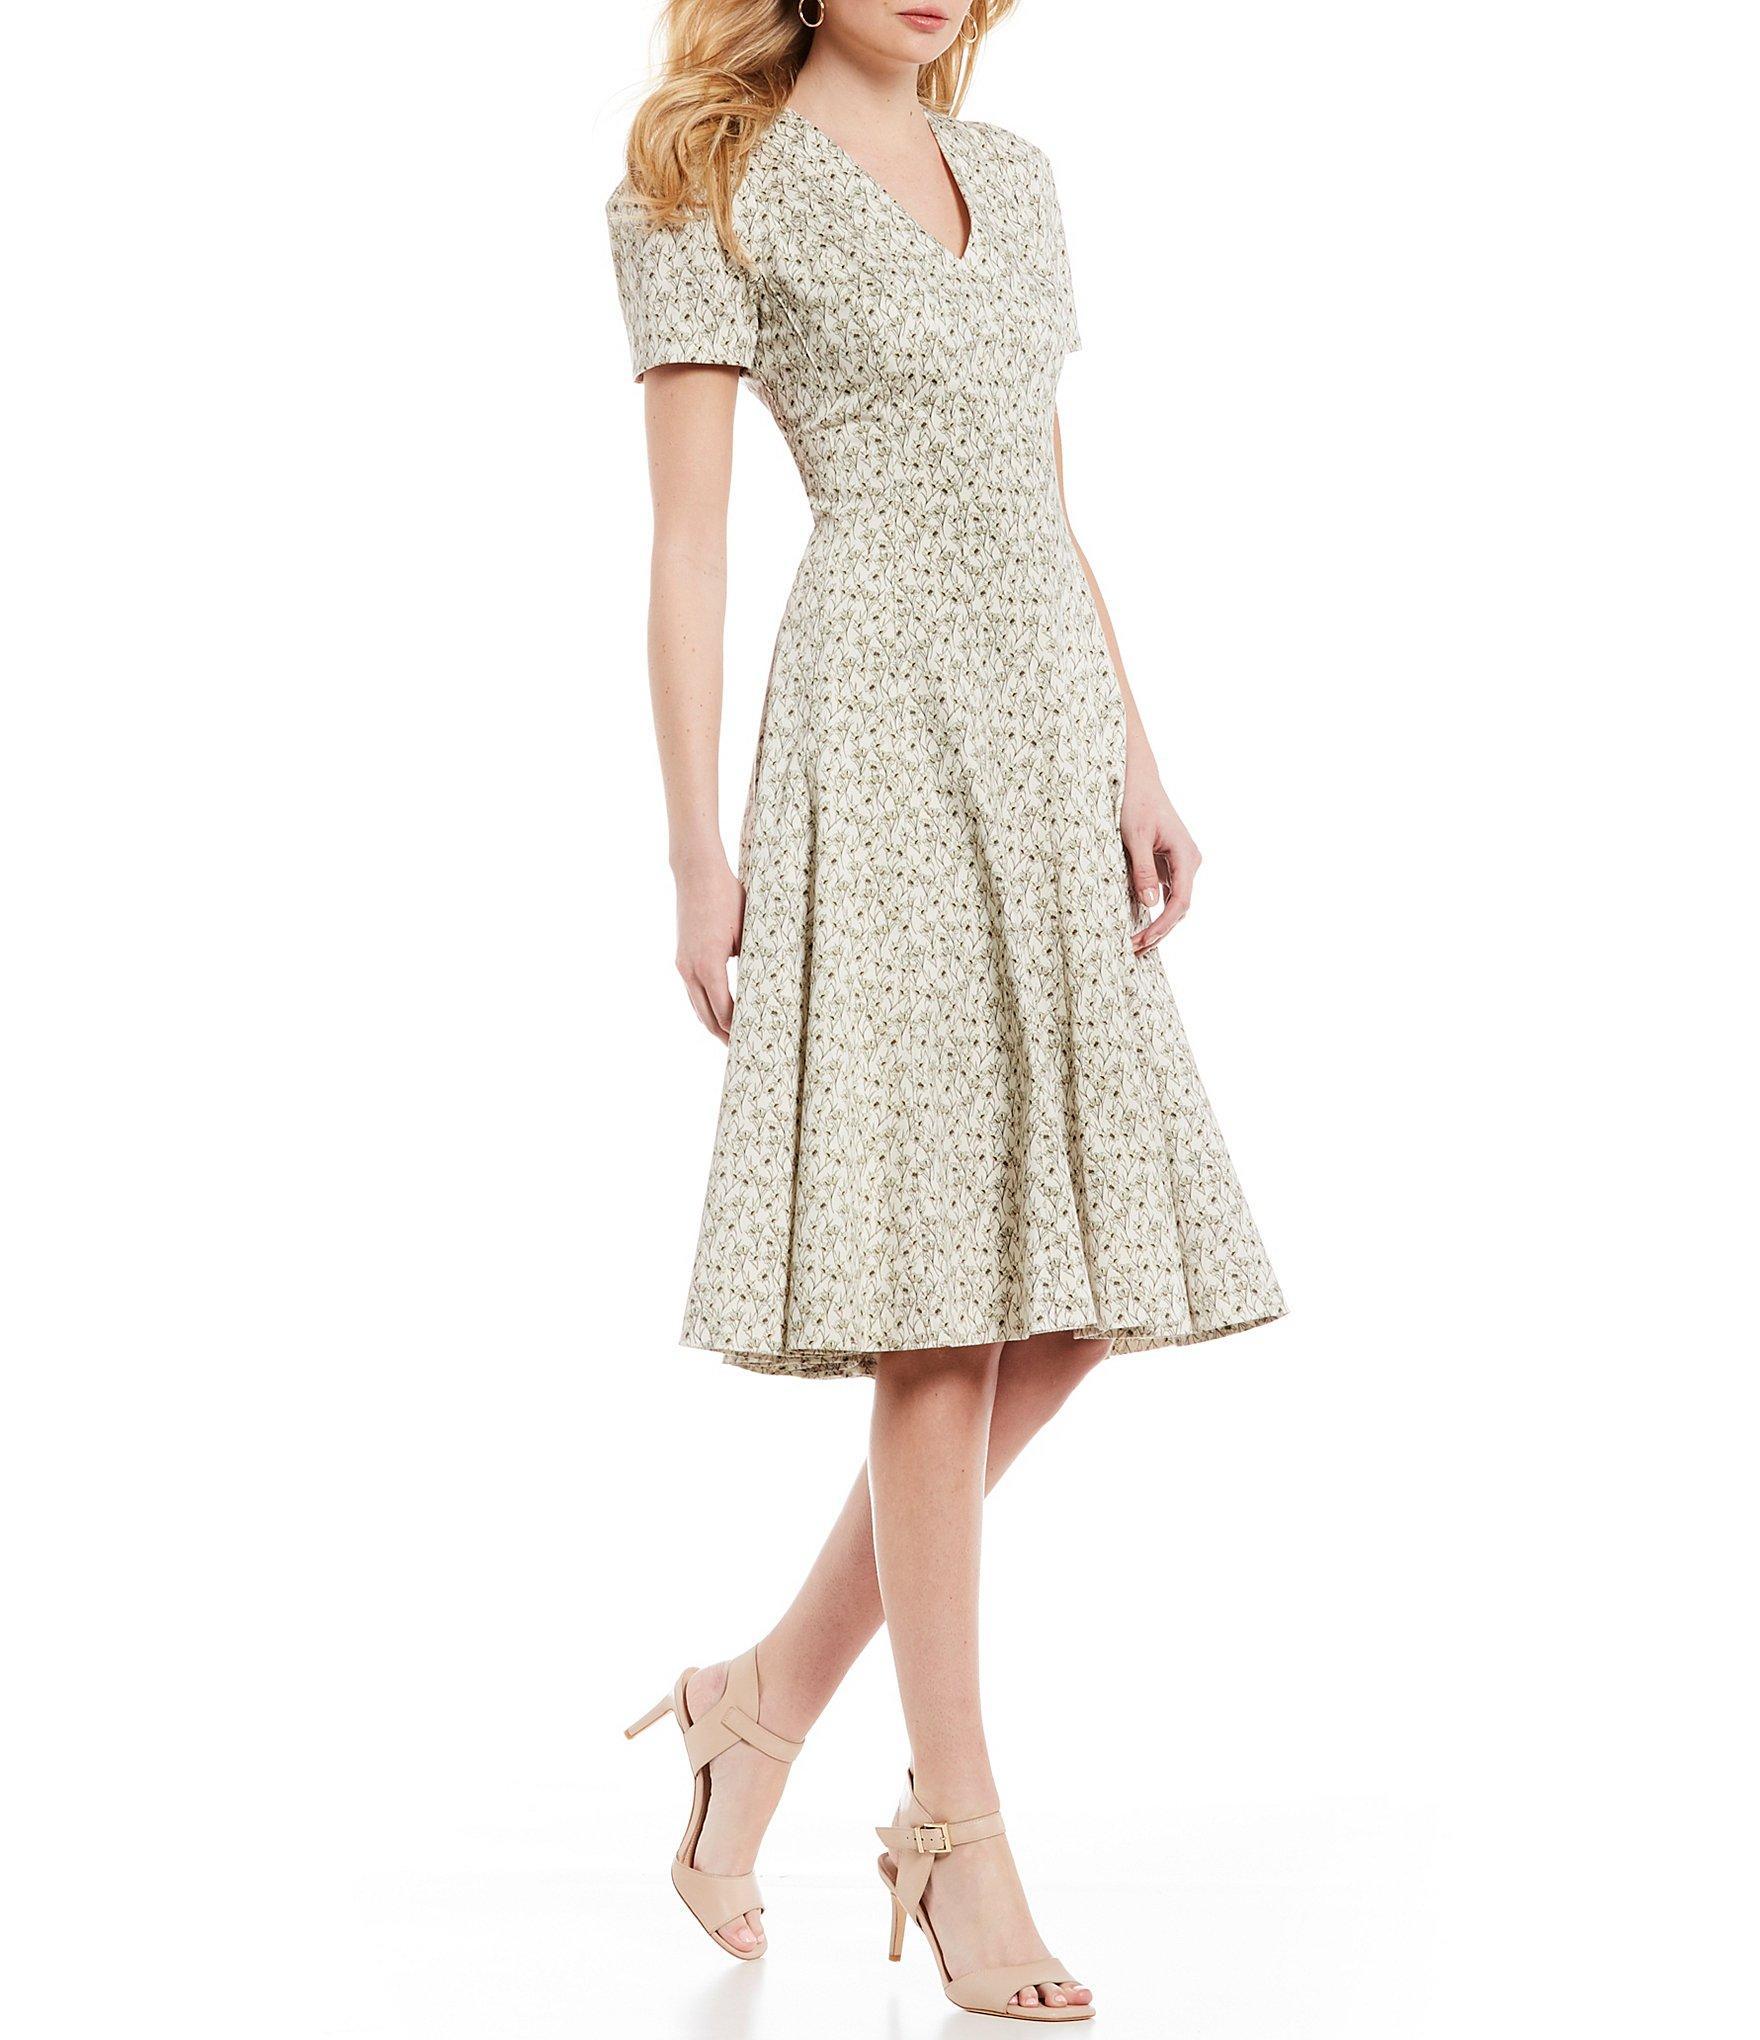 93c2833a83f Antonio Melani. Women s White June Short Sleeve Floral Print V-neck A-line Midi  Dress